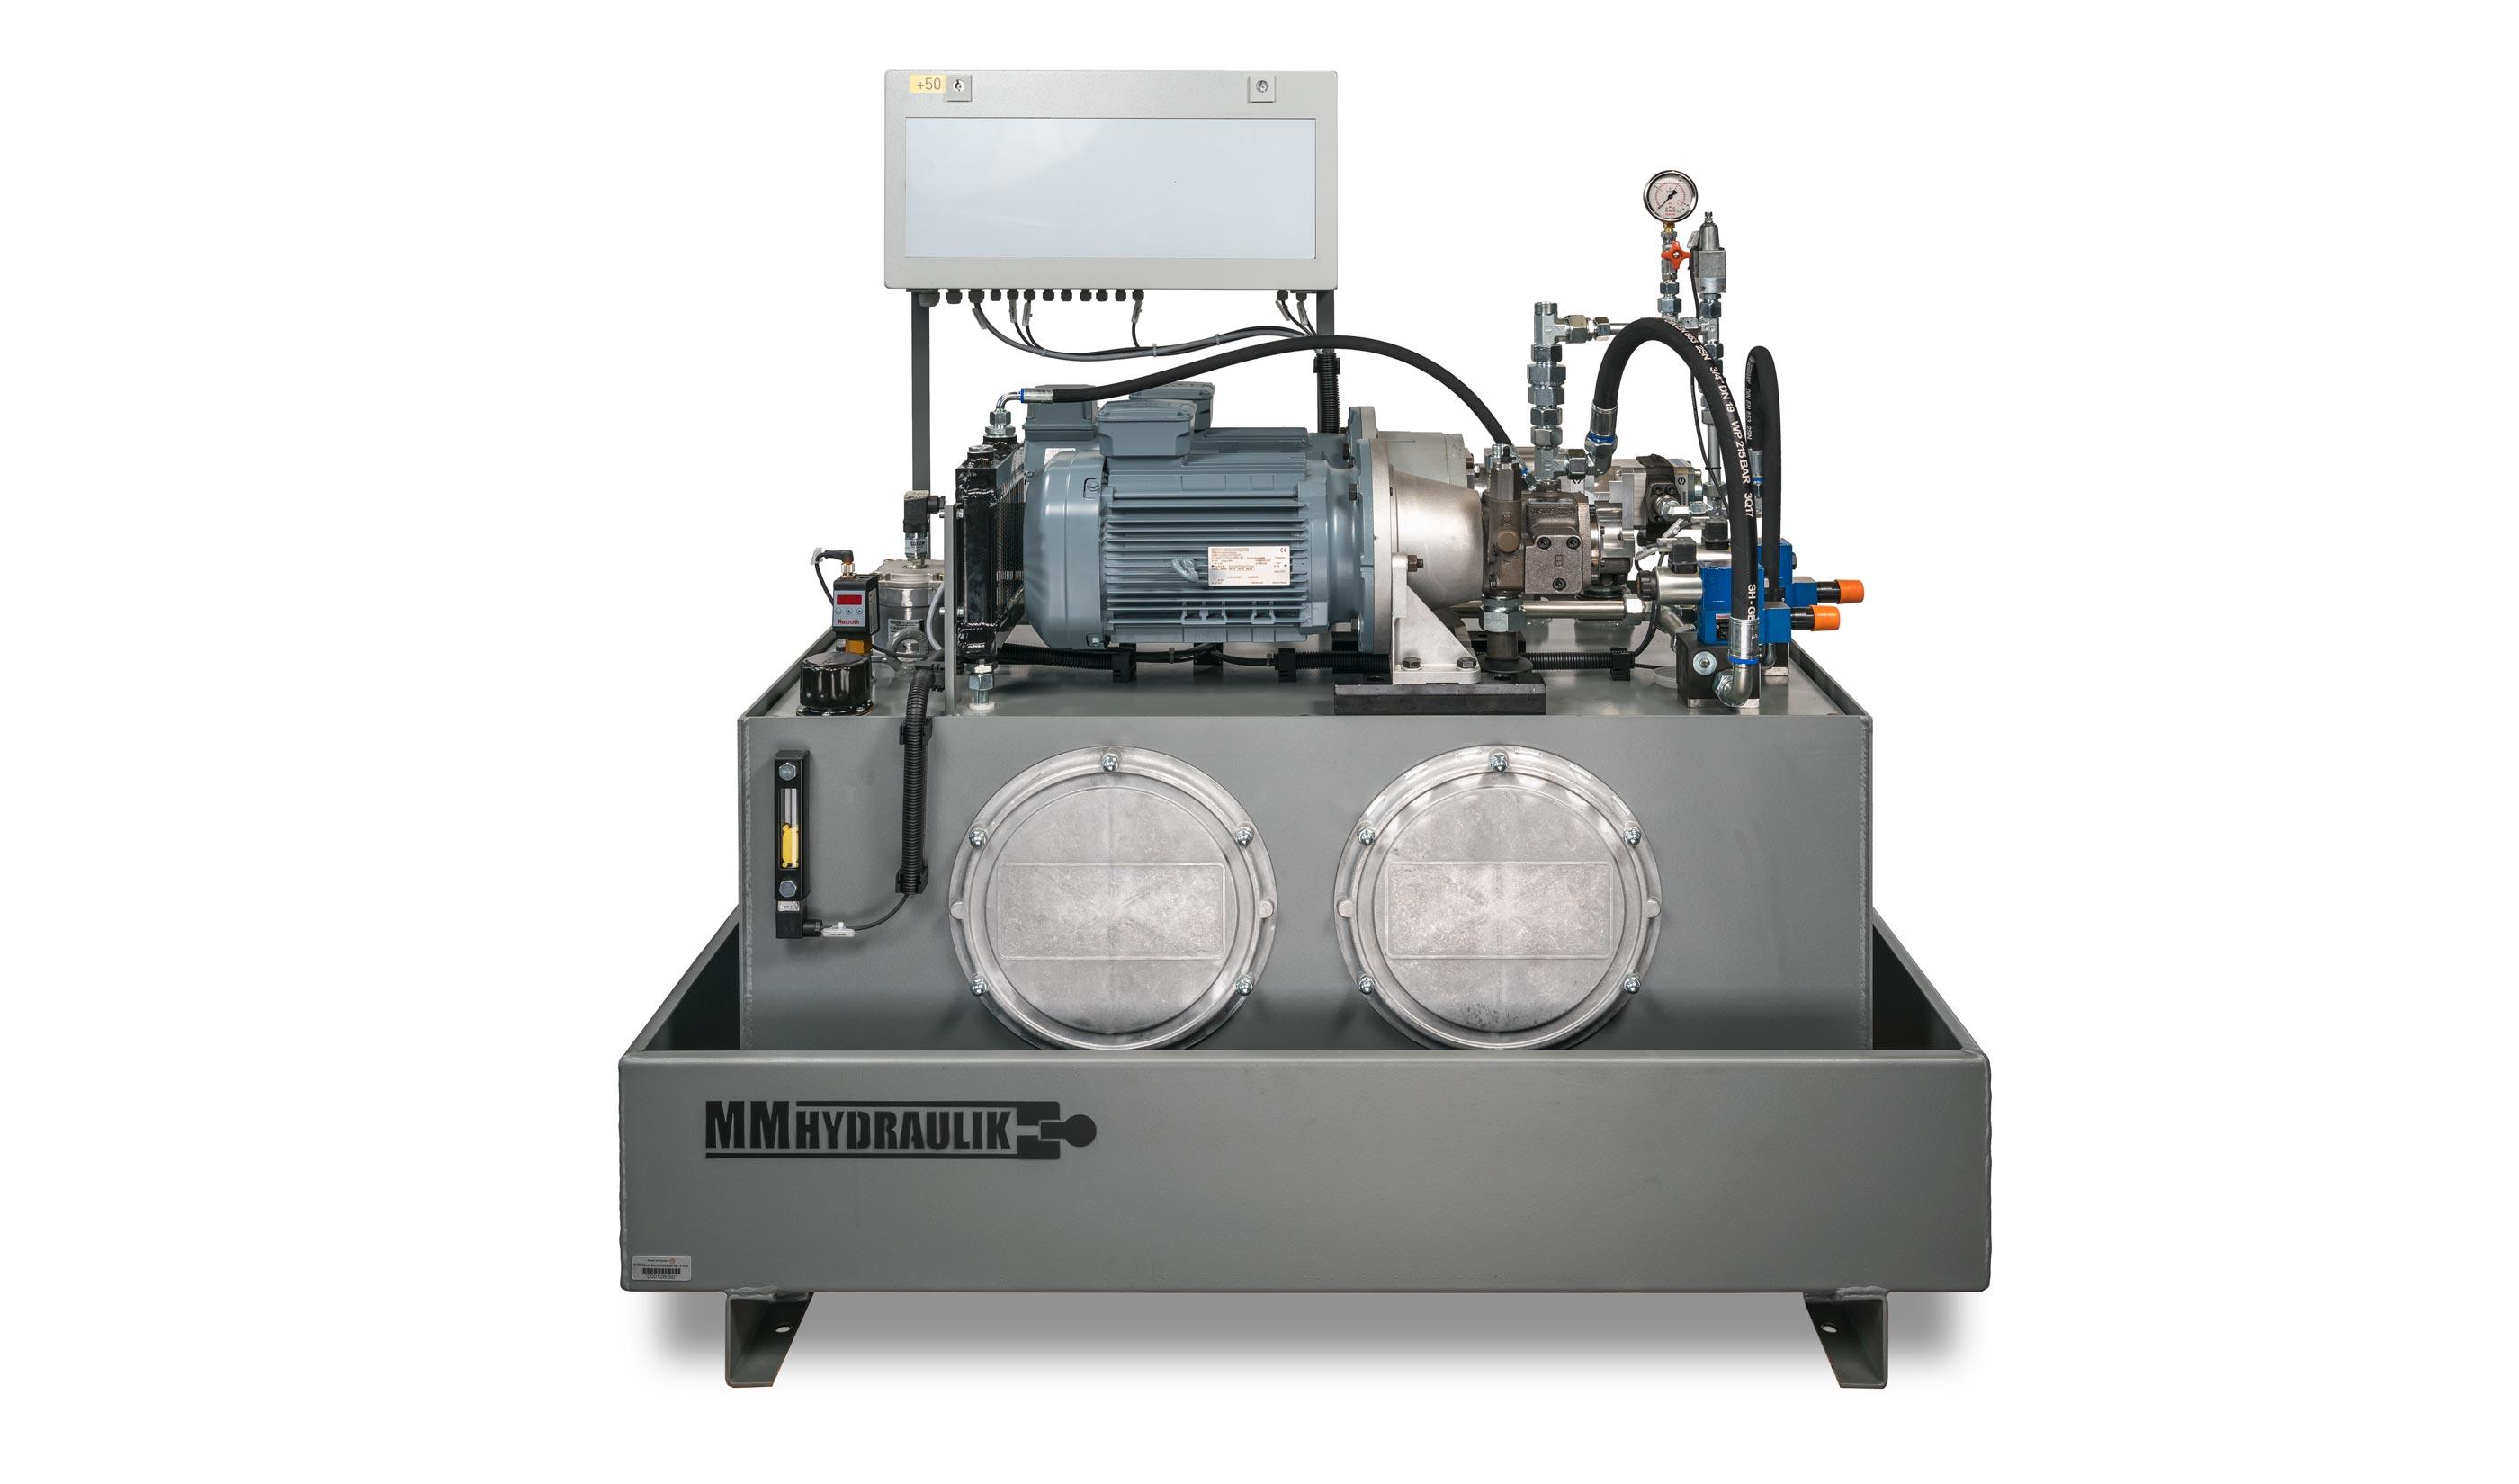 MM-Hydraulik Langenau, Alb Donau Kreis, Hydraulik Neubau, Umbau, Modernisierung, Wartung, Instandhaltung, Service, Hydraulikagregat